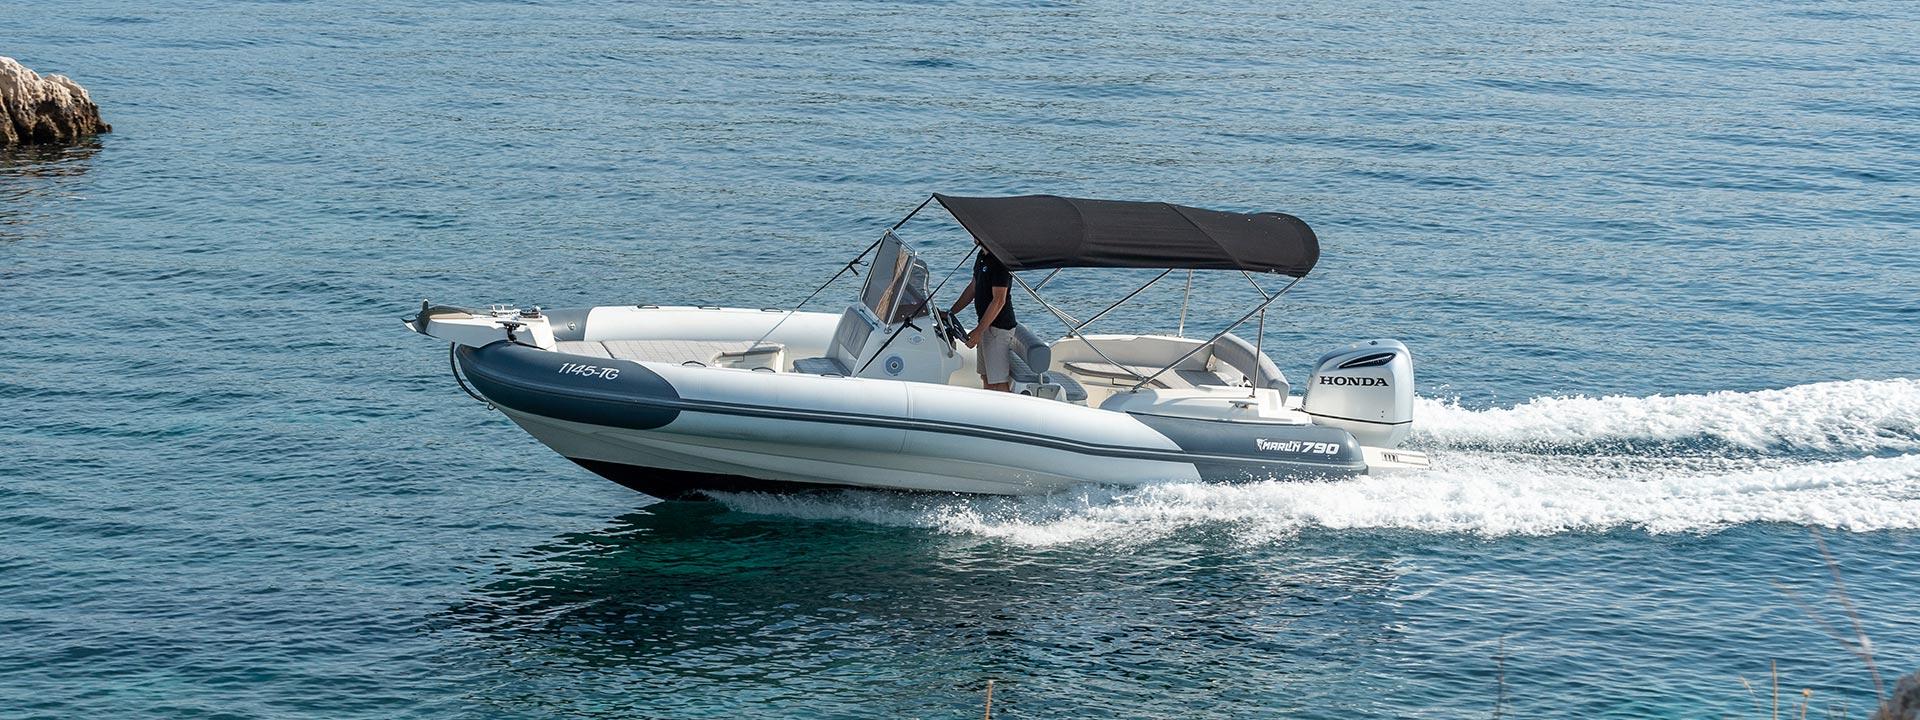 mayer-charter-boat-header-jeanneau-marlin-790-01